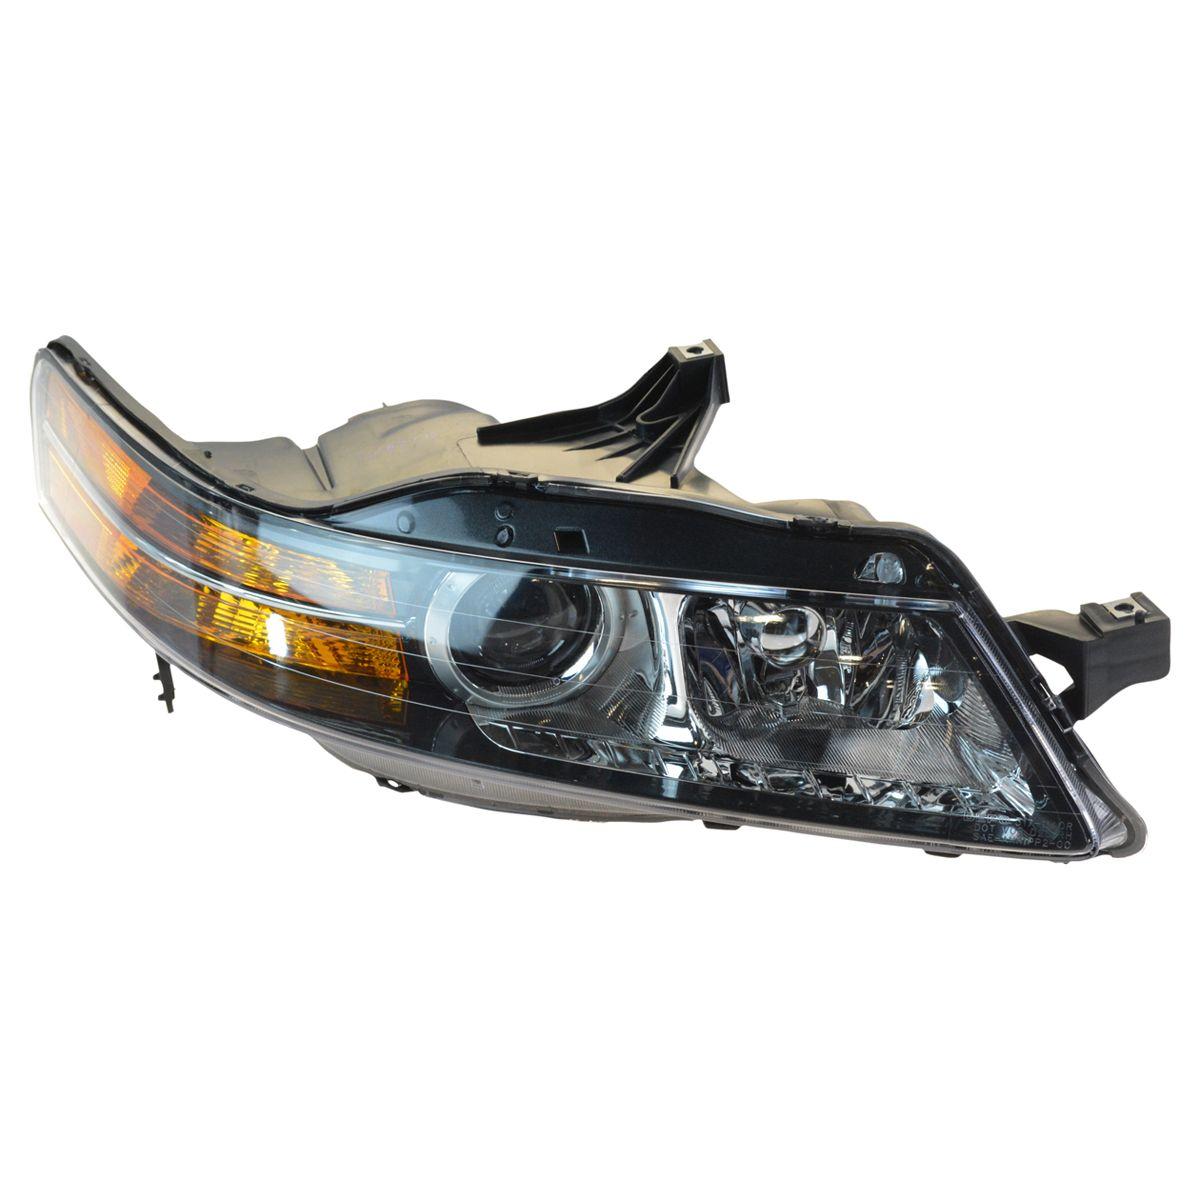 HID Xenon Headlight Headlamp RH Right Passenger Side For